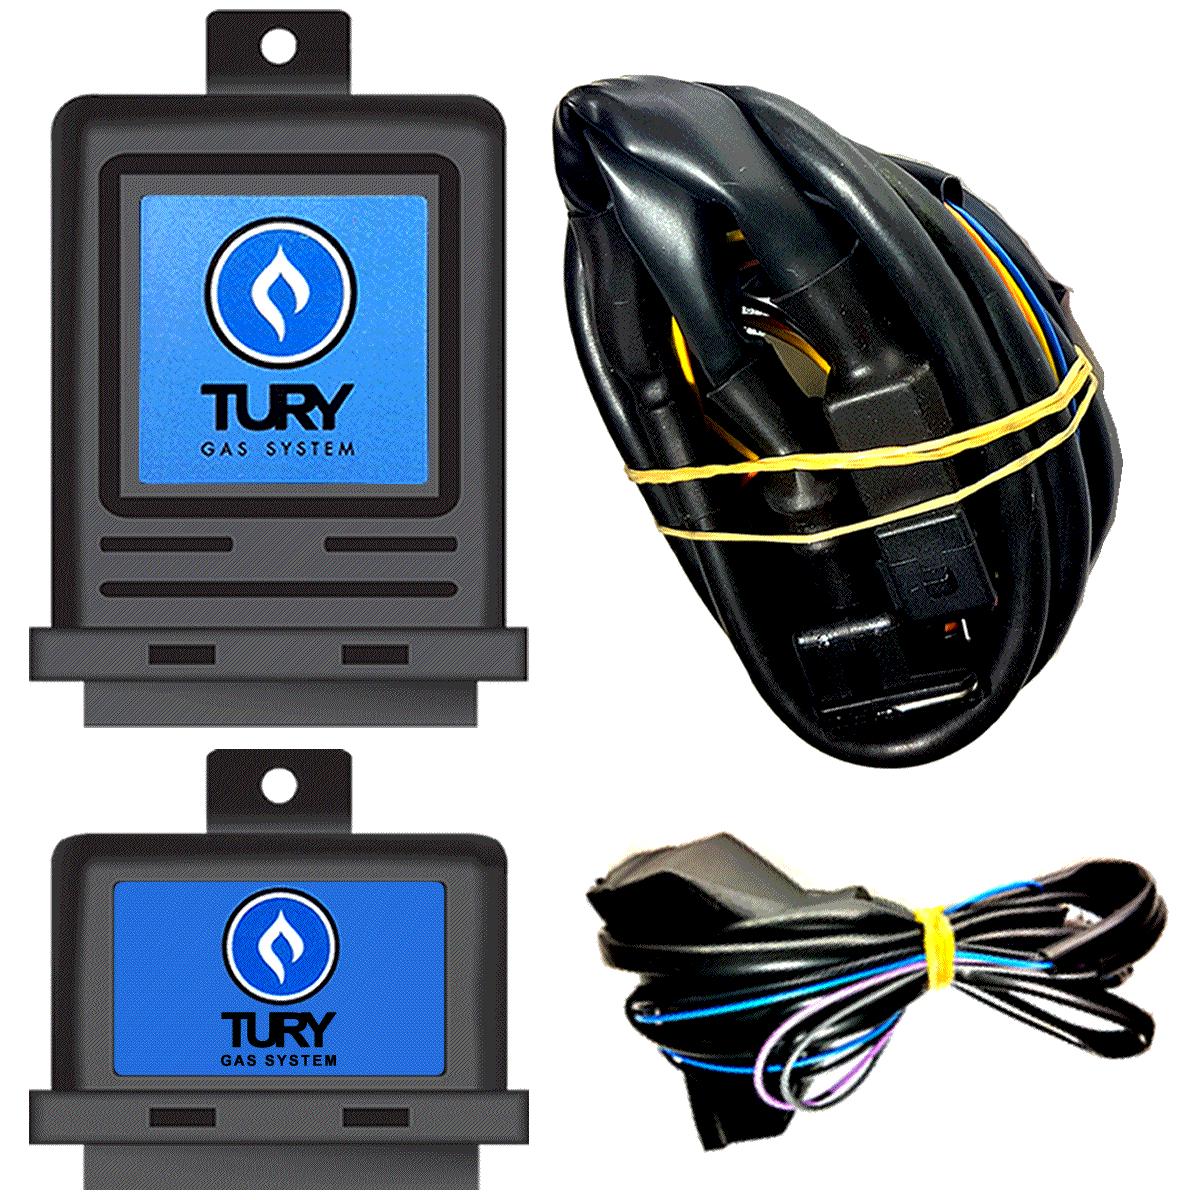 Variador de Avanço e Simulador de Sonda Lambda Flex TURY T68